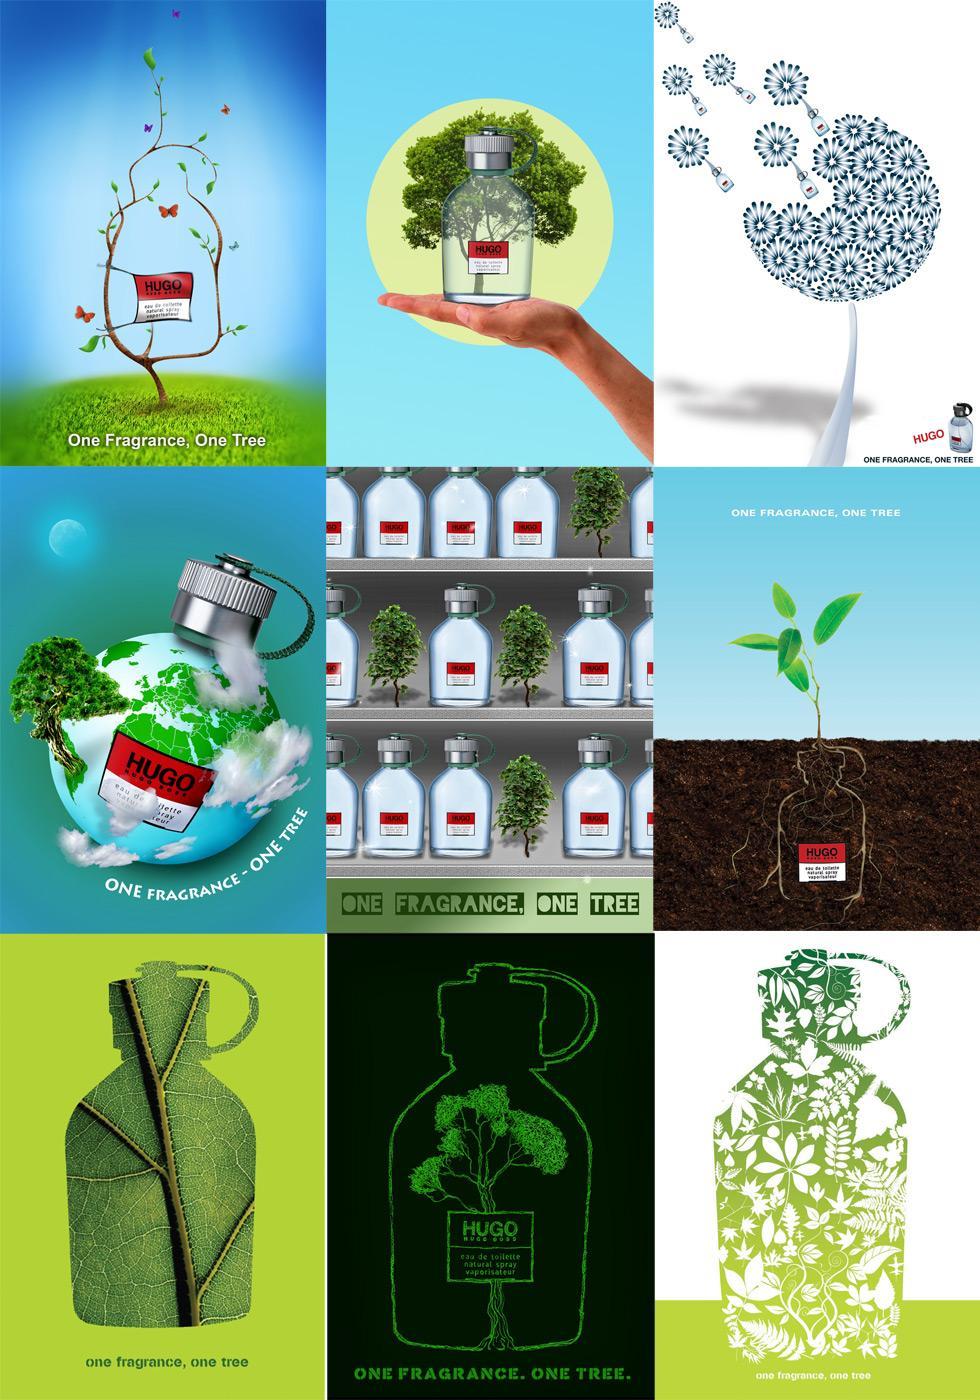 Hugo Boss Digital Ad -  One Fragrance, One Tree